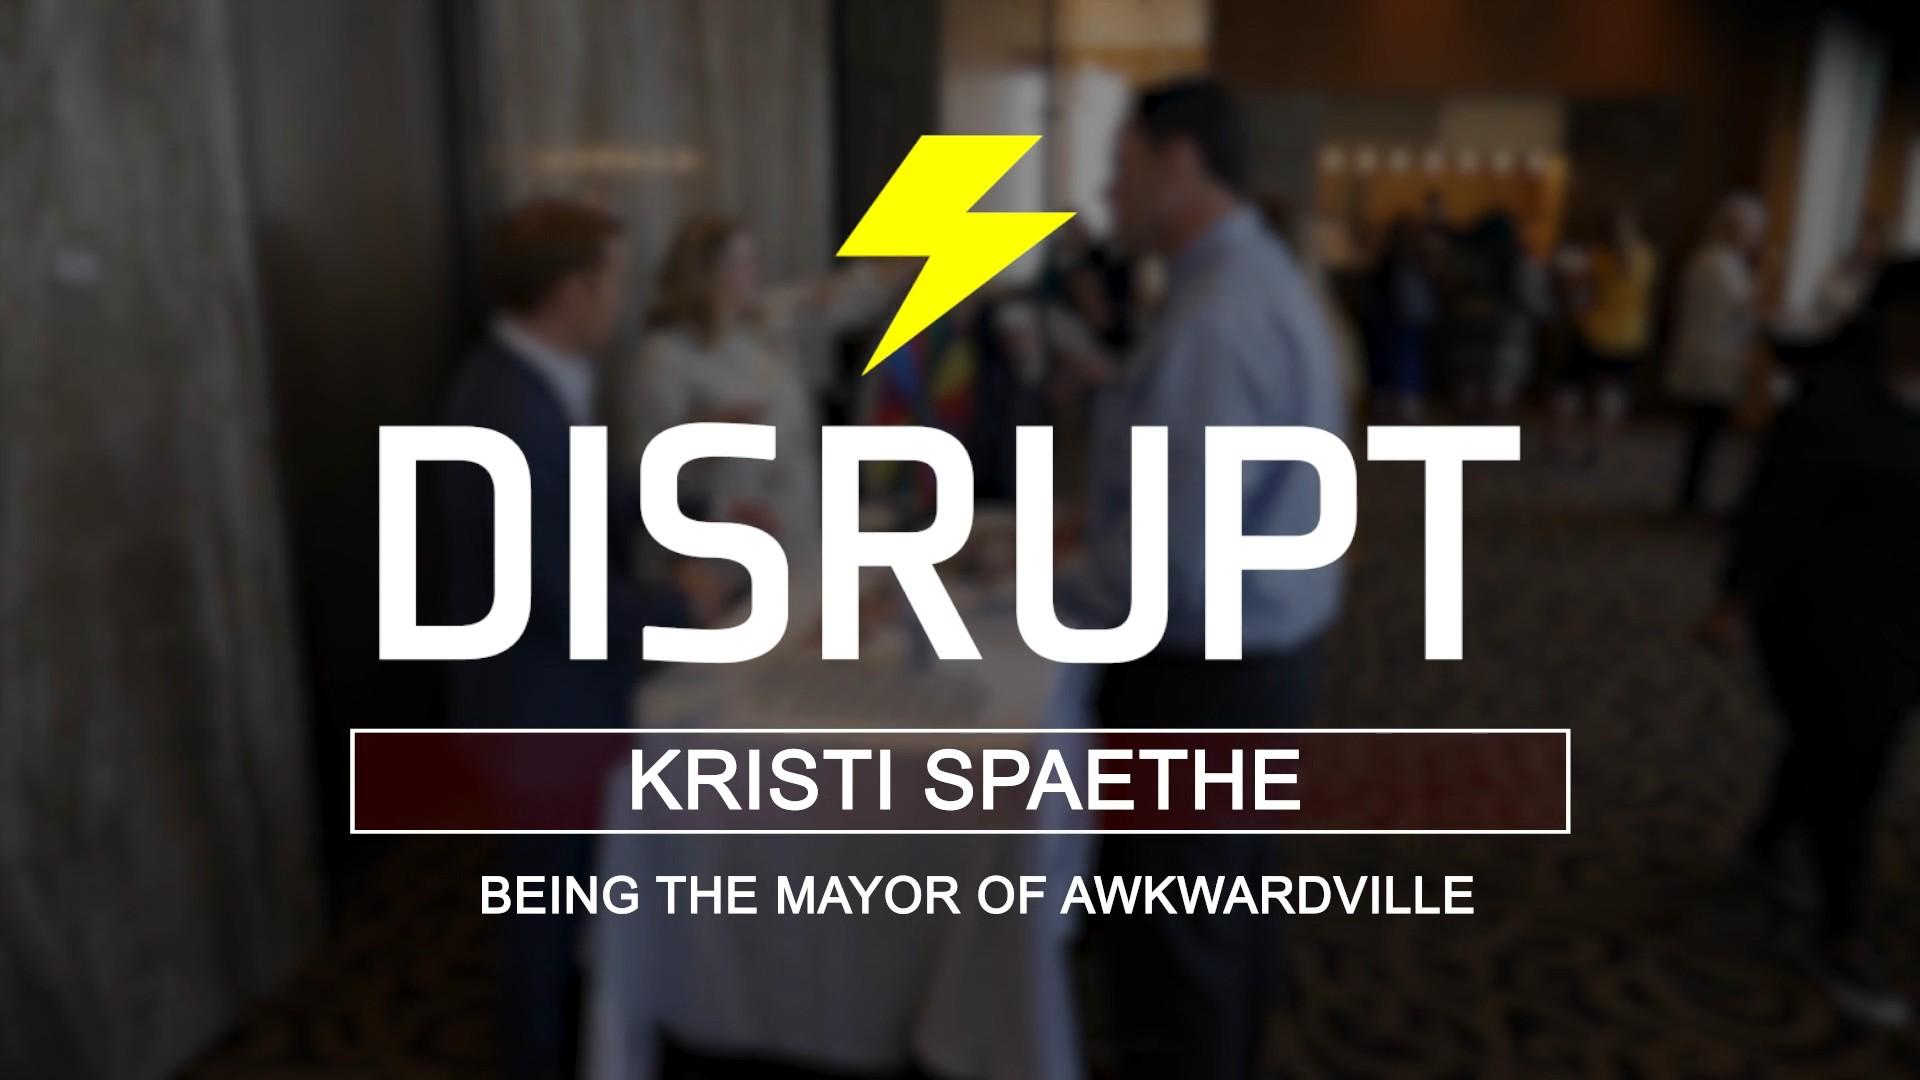 Kristi Spaethe _DisruptHR_page1_image1